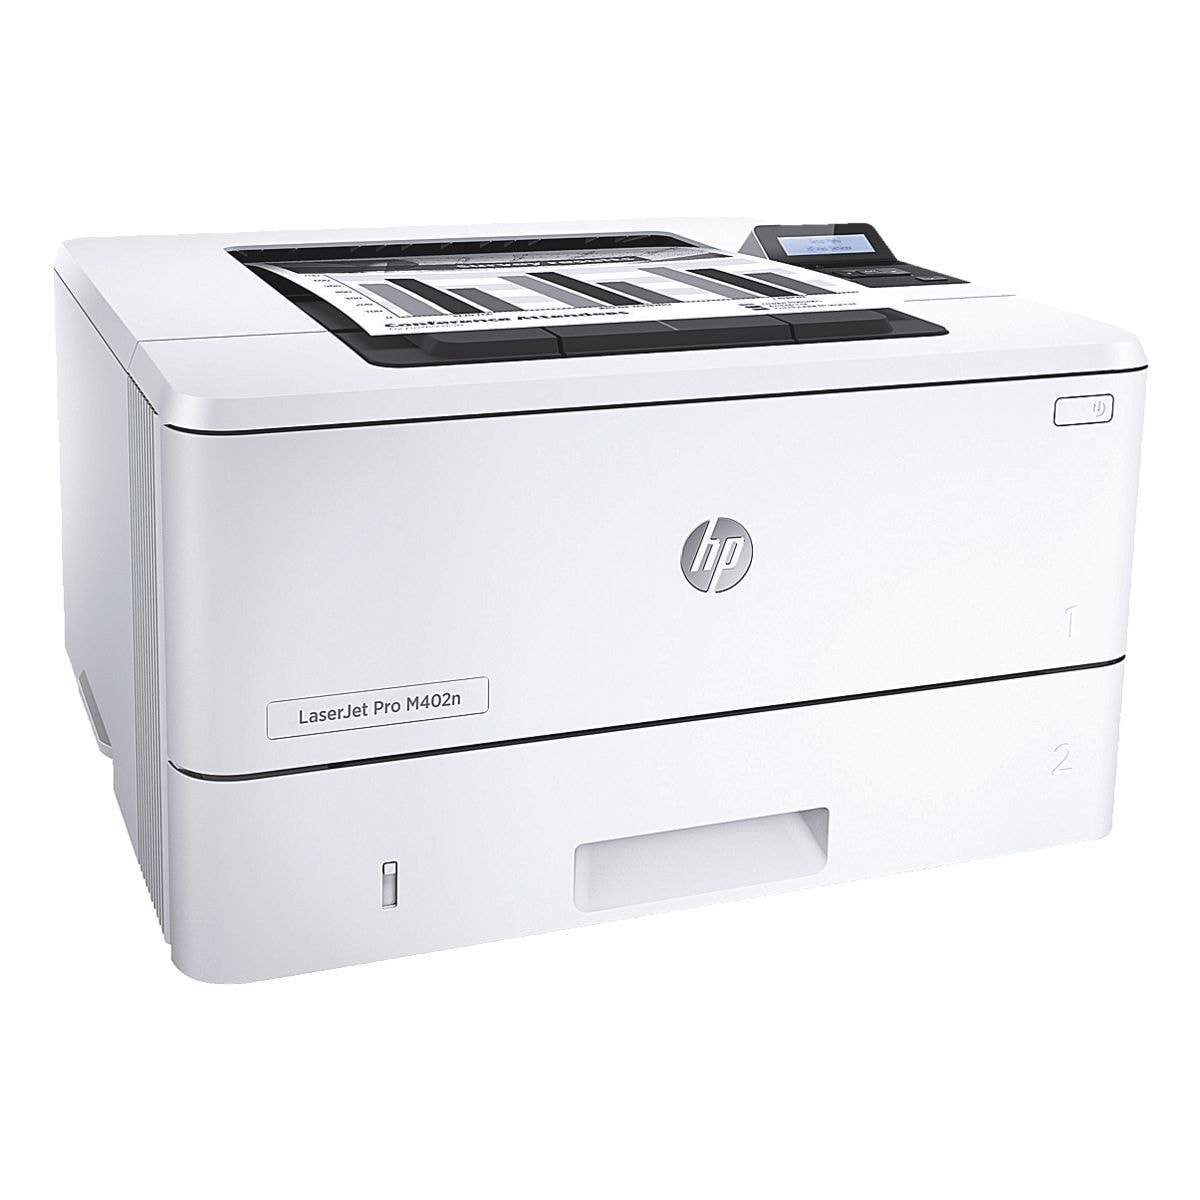 HP Laserdrucker LaserJet Pro M402n, A4 schwarz weiß Laserdrucker, 1200 x 1200 dpi, mit LAN